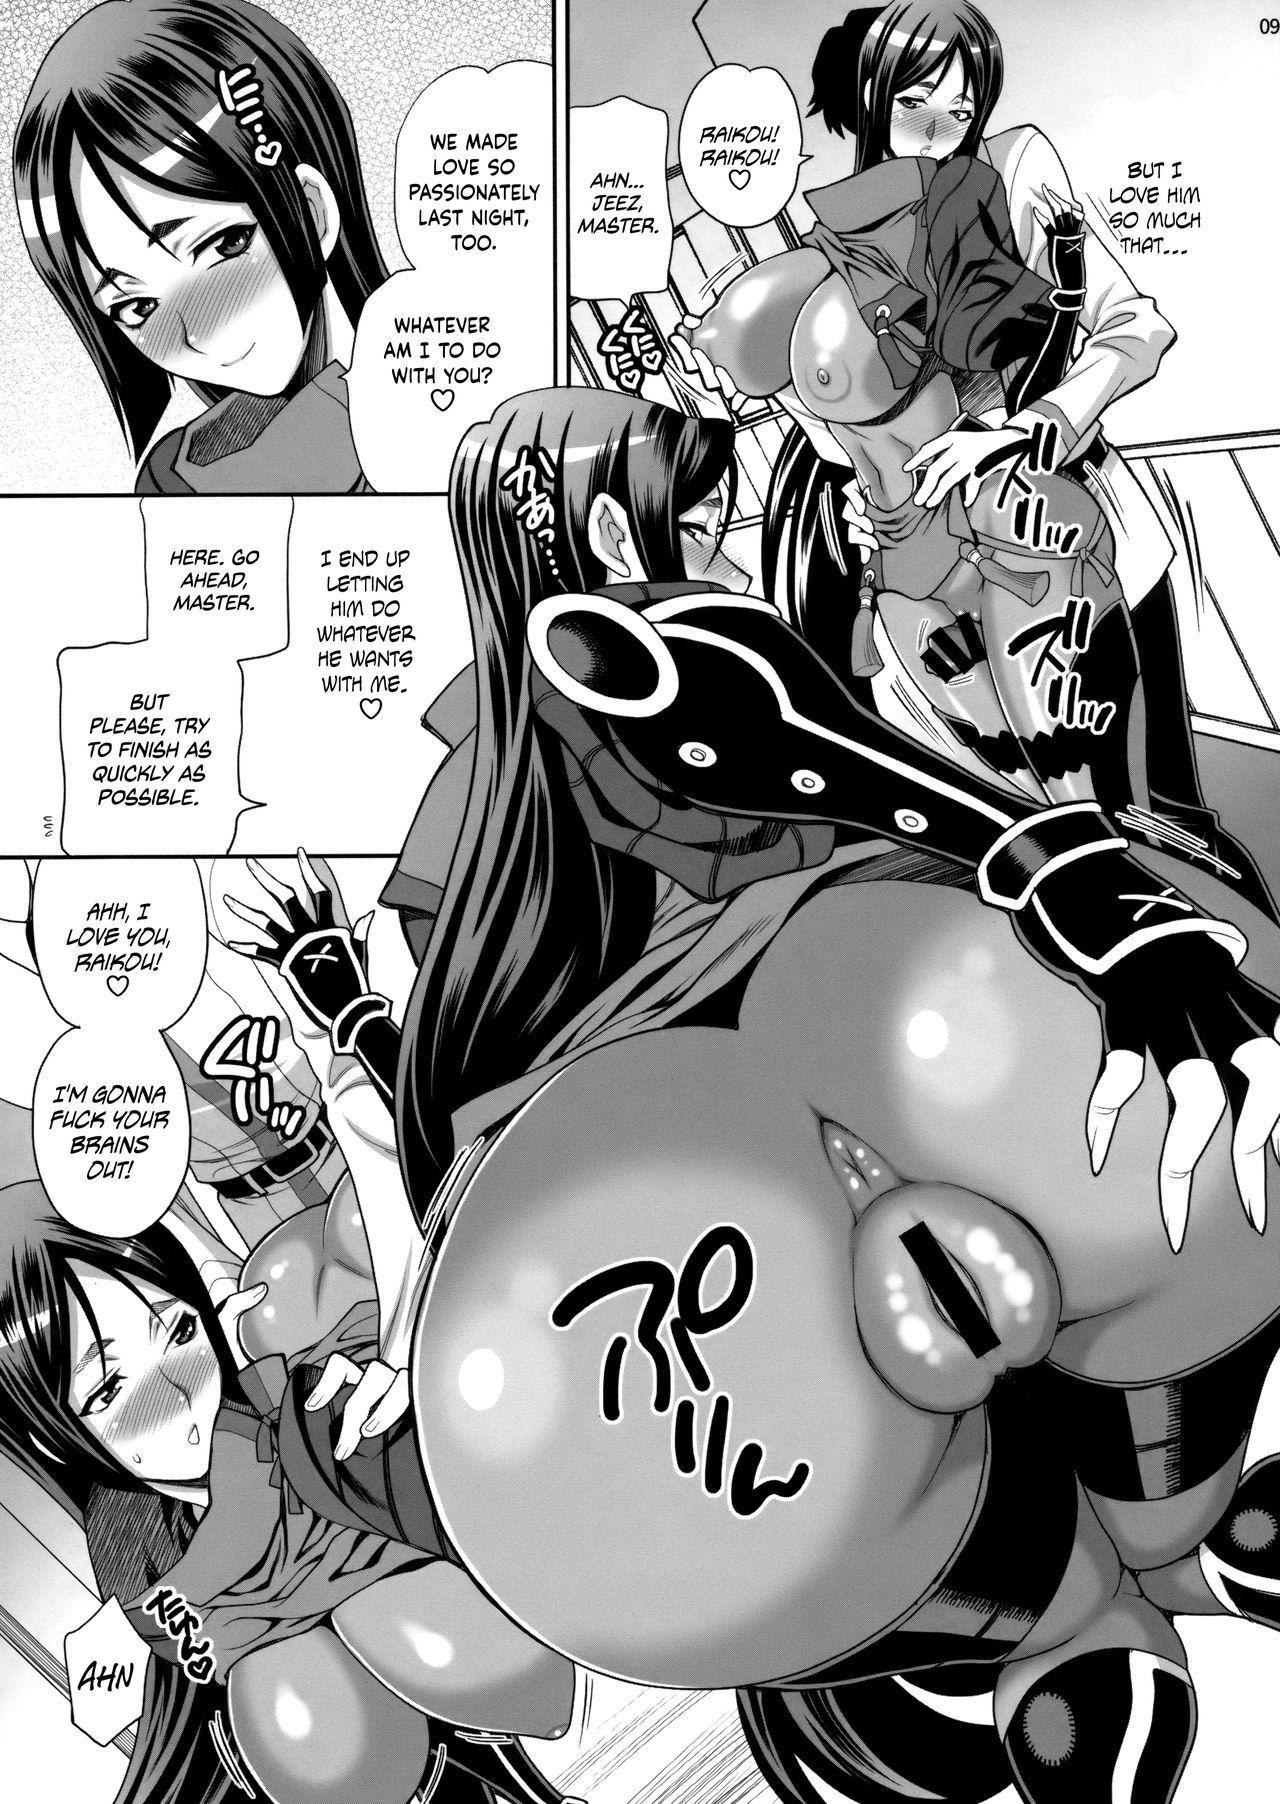 Yukiyanagi no Hon 42 Master, Gokinsei desu yo!   It's Immoral, My Master! Yukiyanagi's Book 42 7